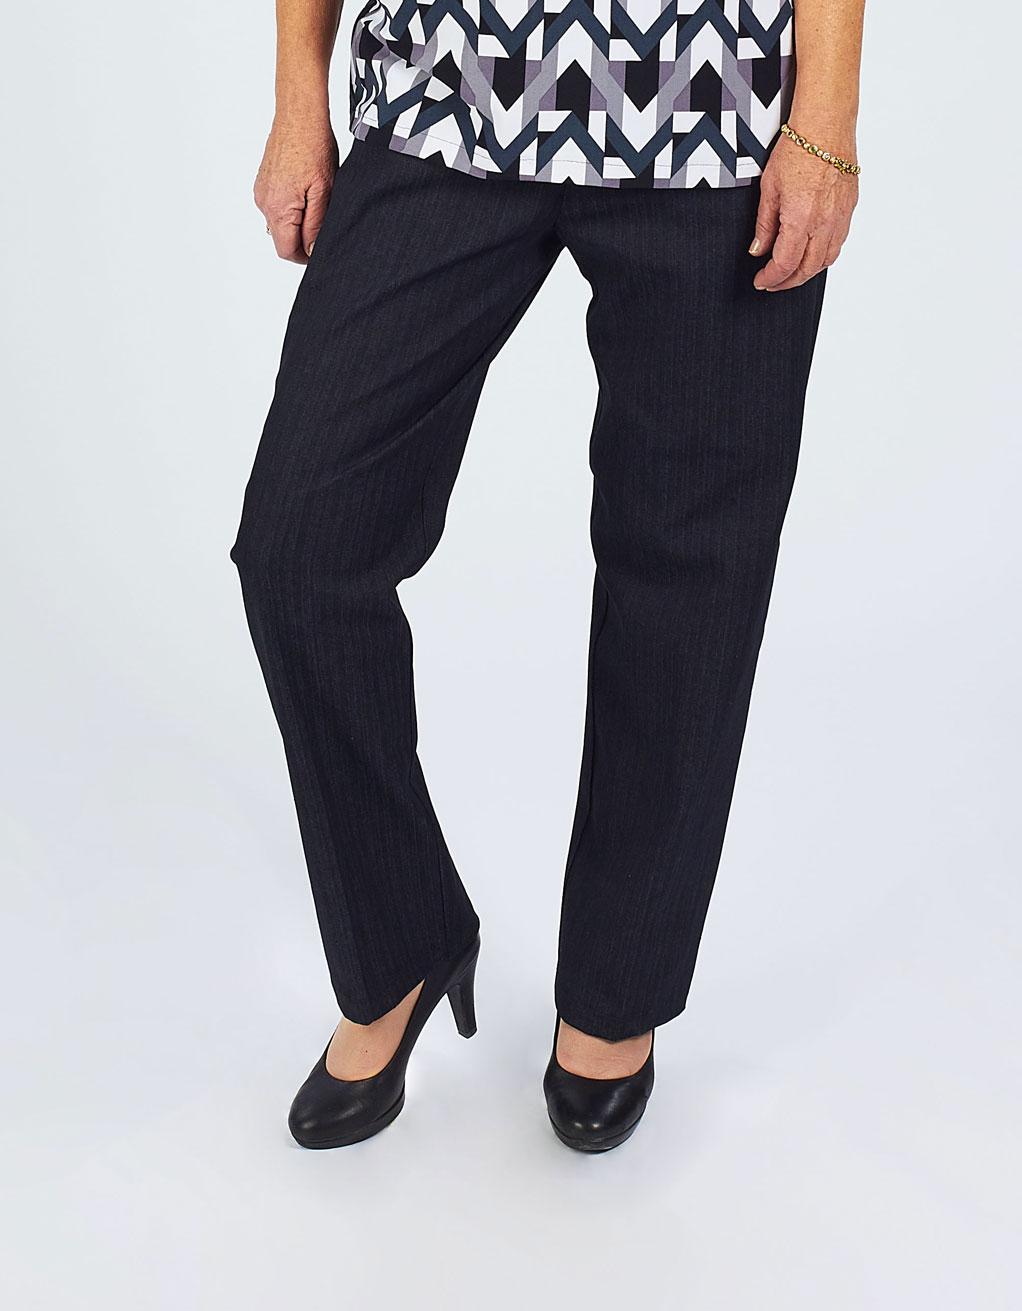 jeans-adaptes-femme-fp62728-bleu